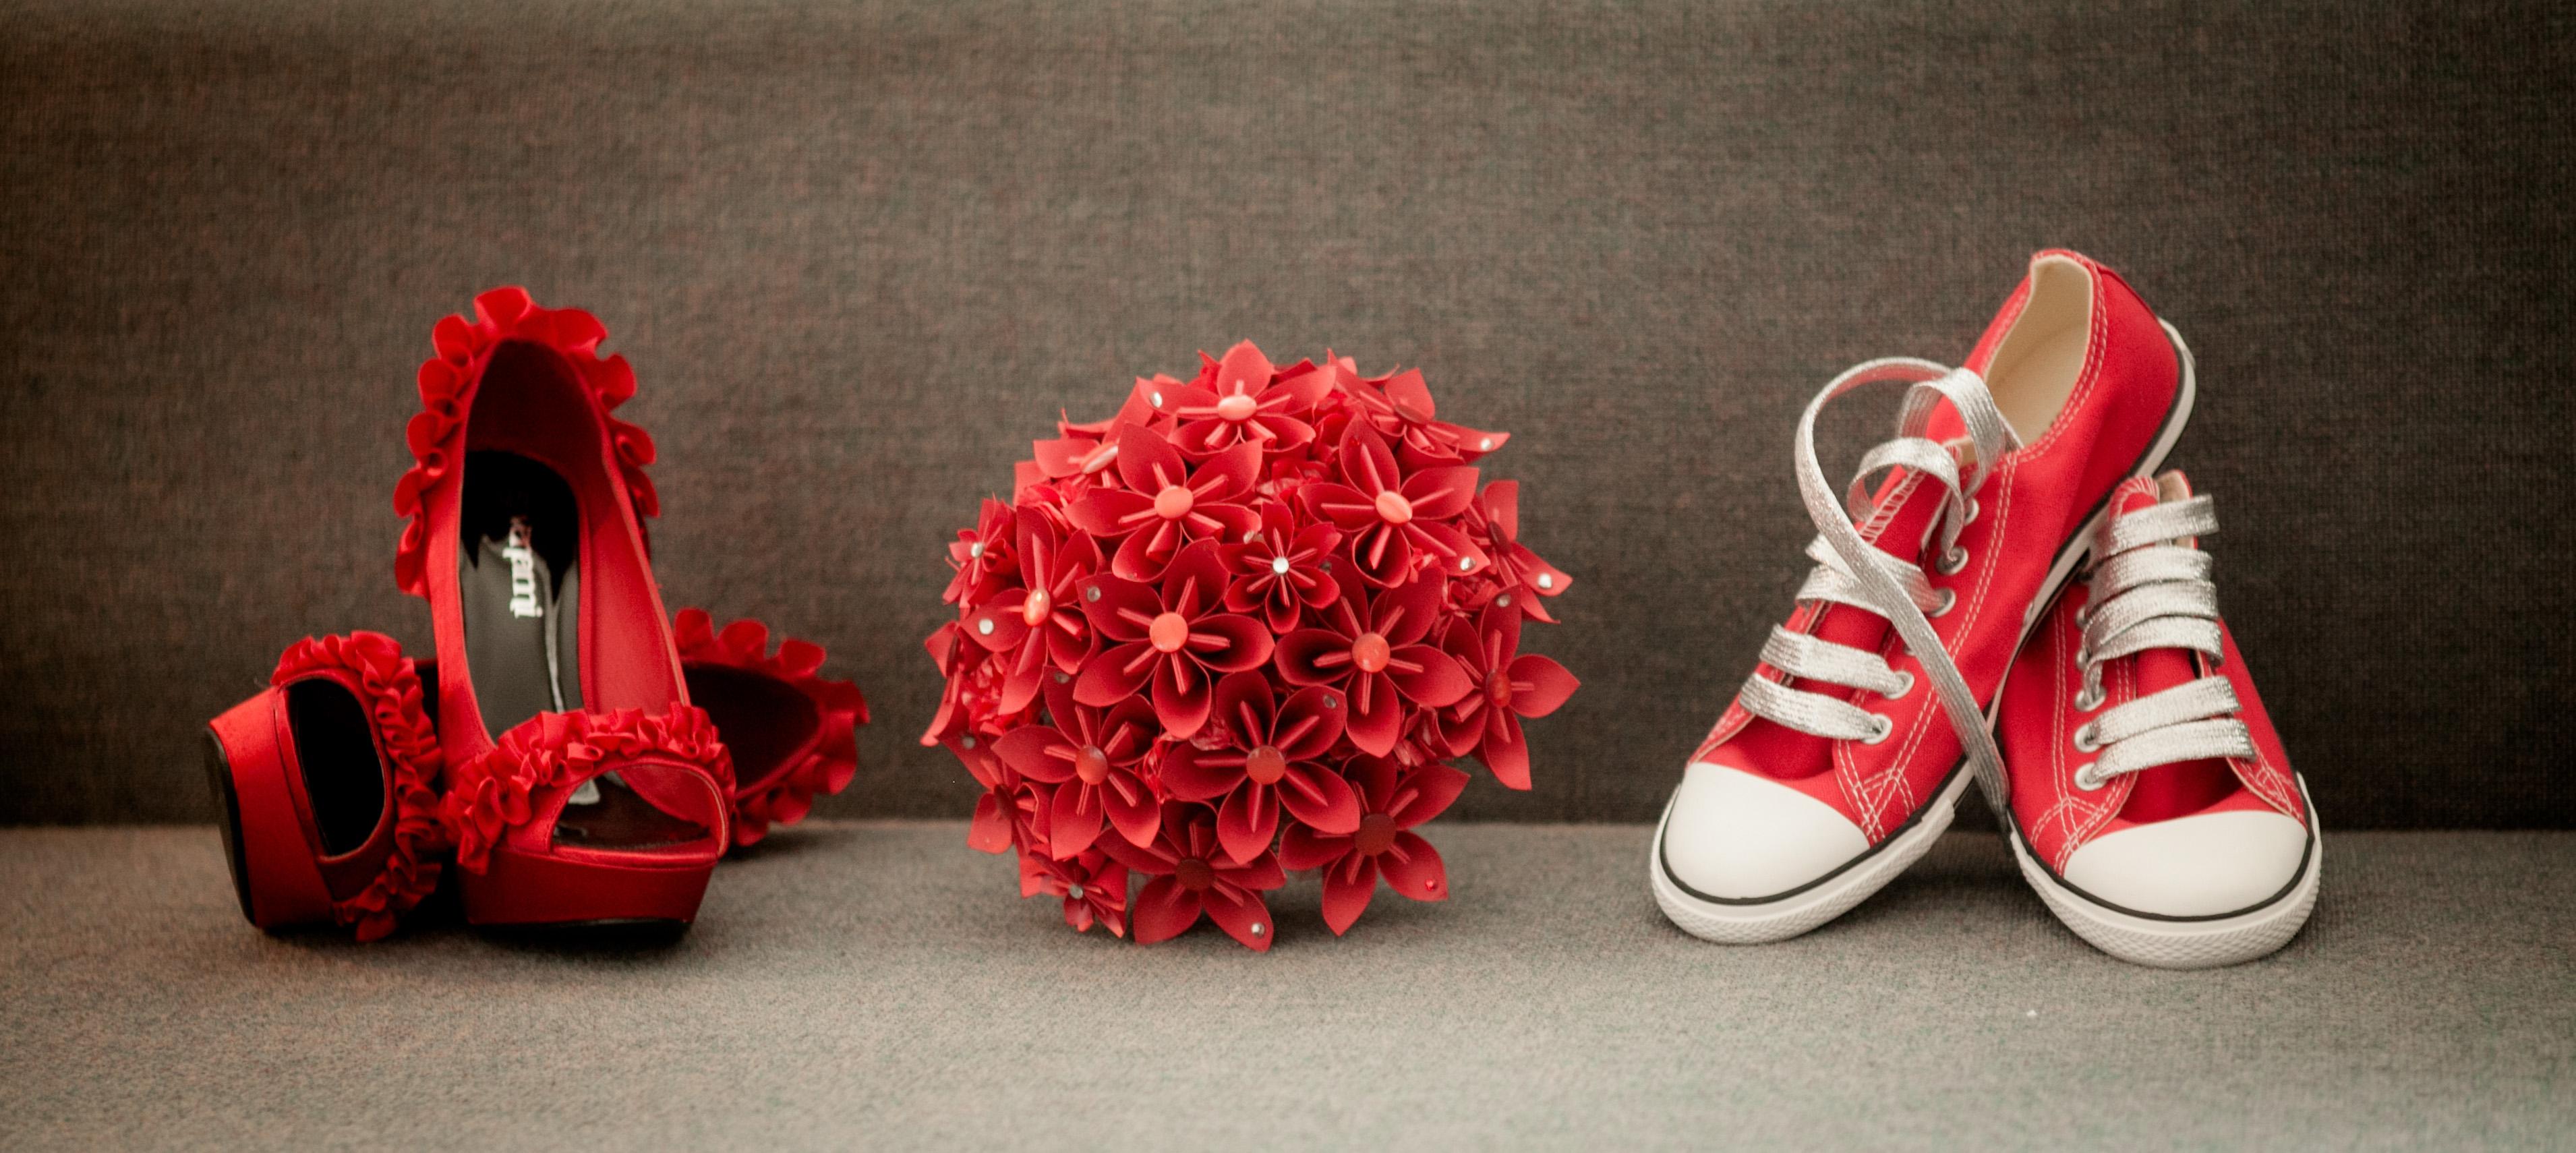 Amor Rojo